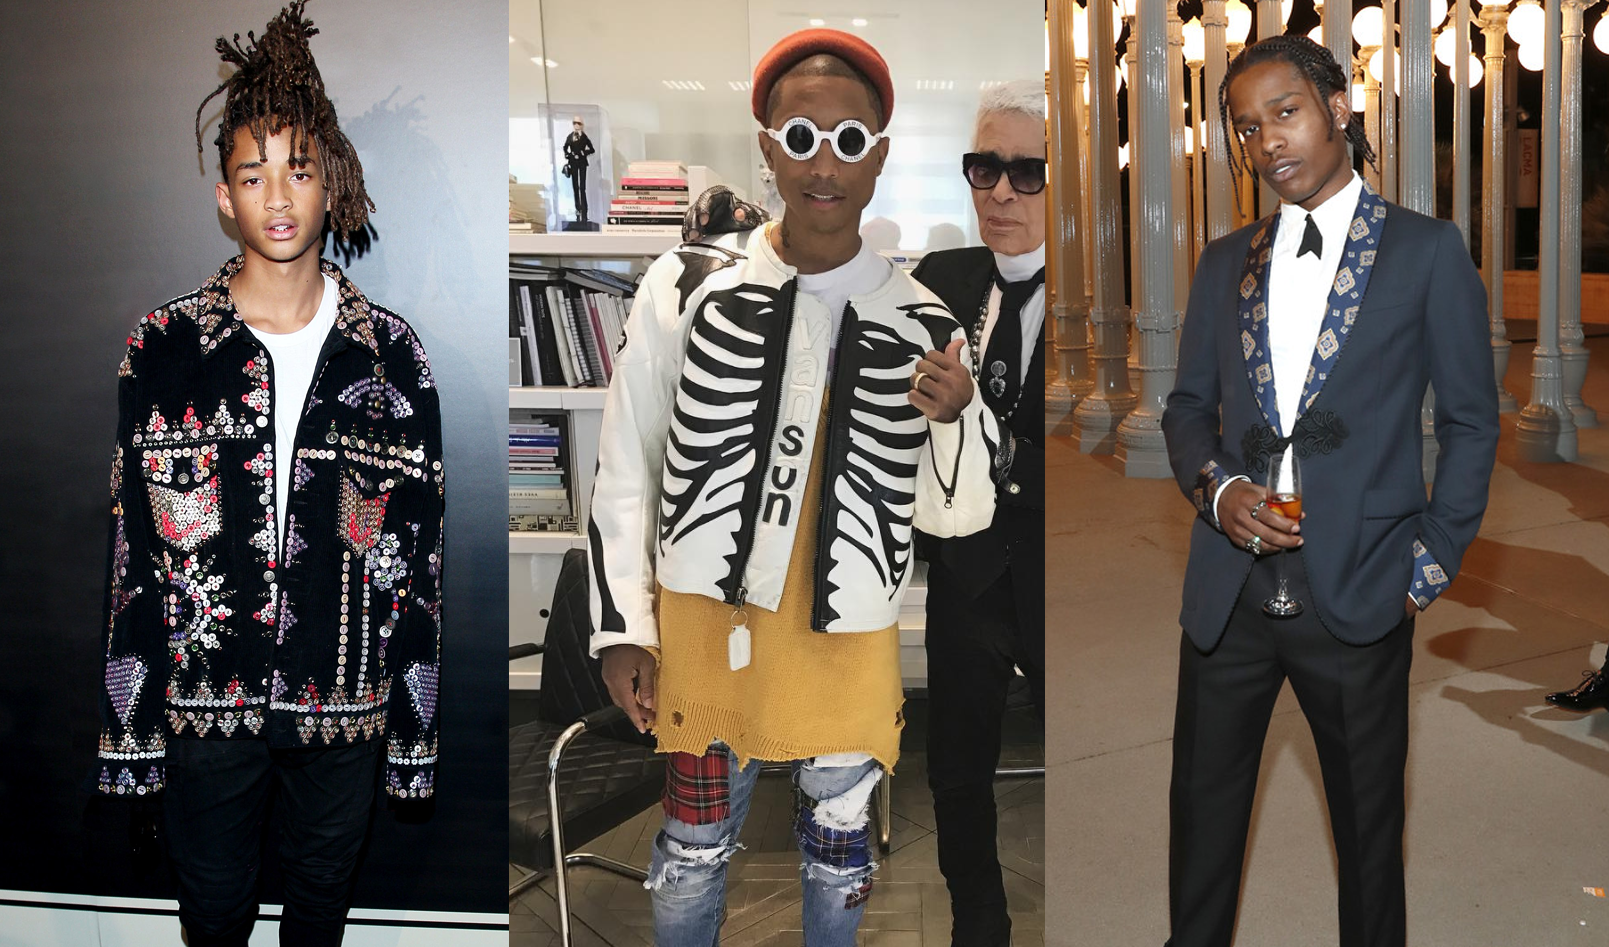 The Best Dressed Celebrities Of 2016